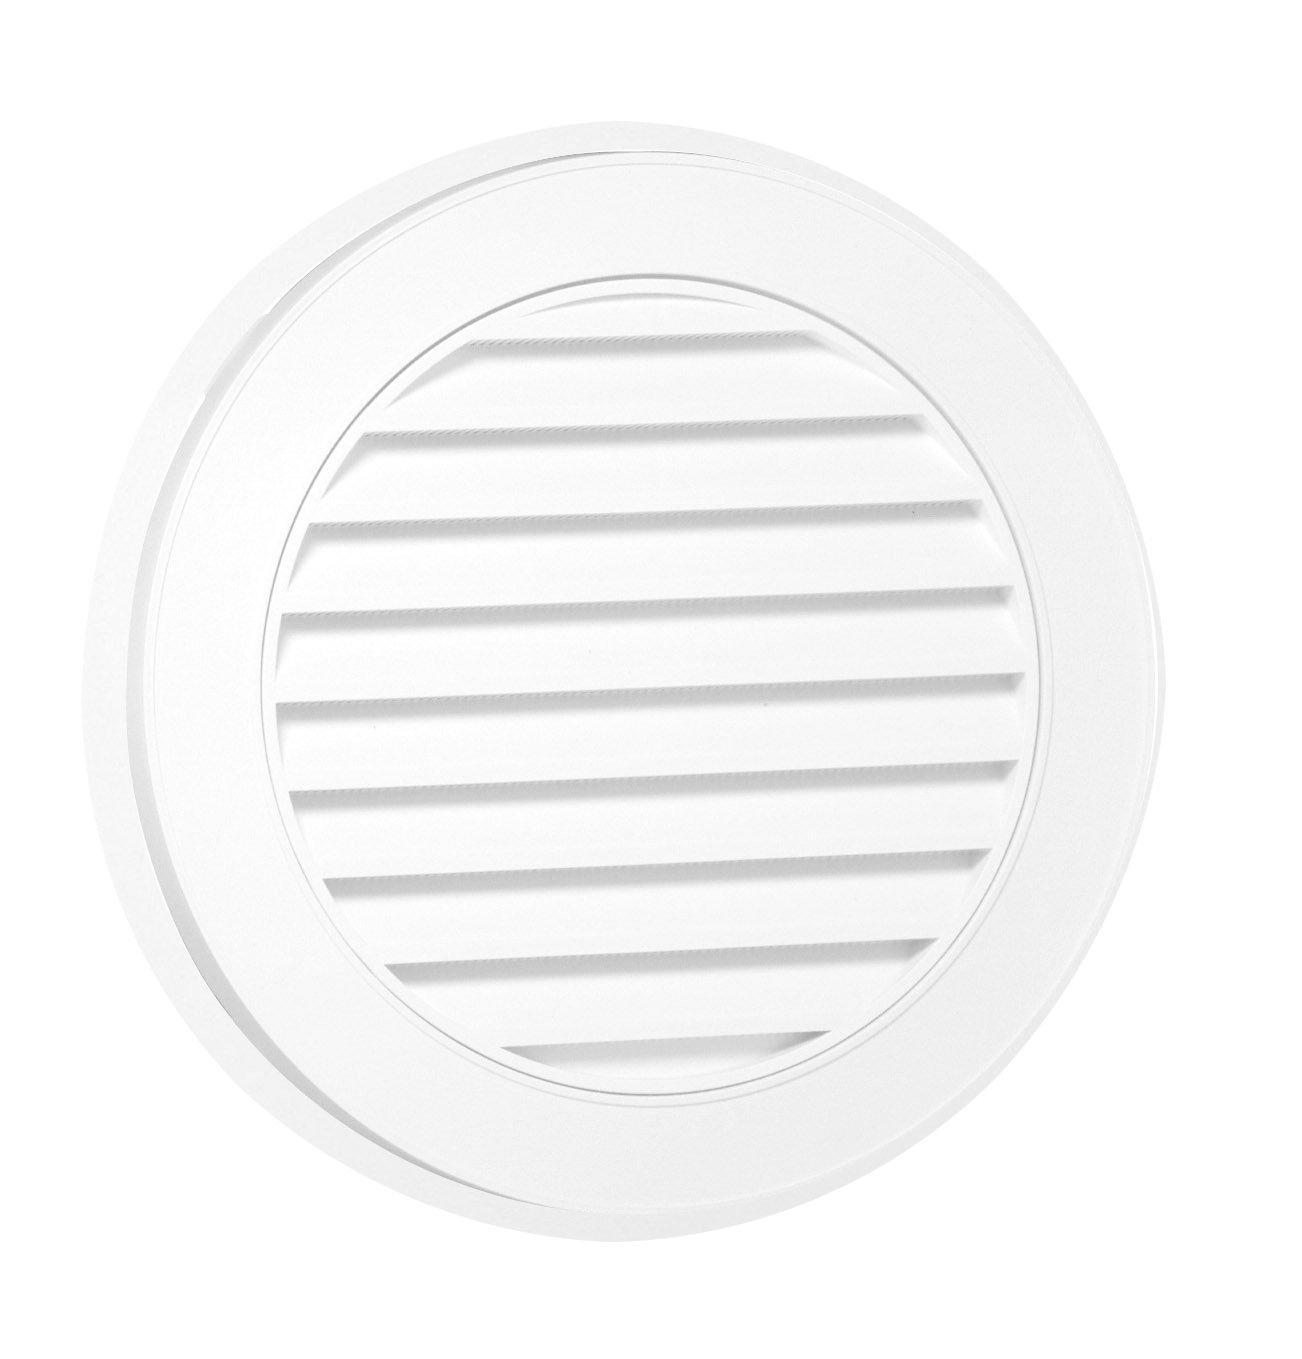 Duraflo 626053-00 18-Inch Round Gable Vent, White